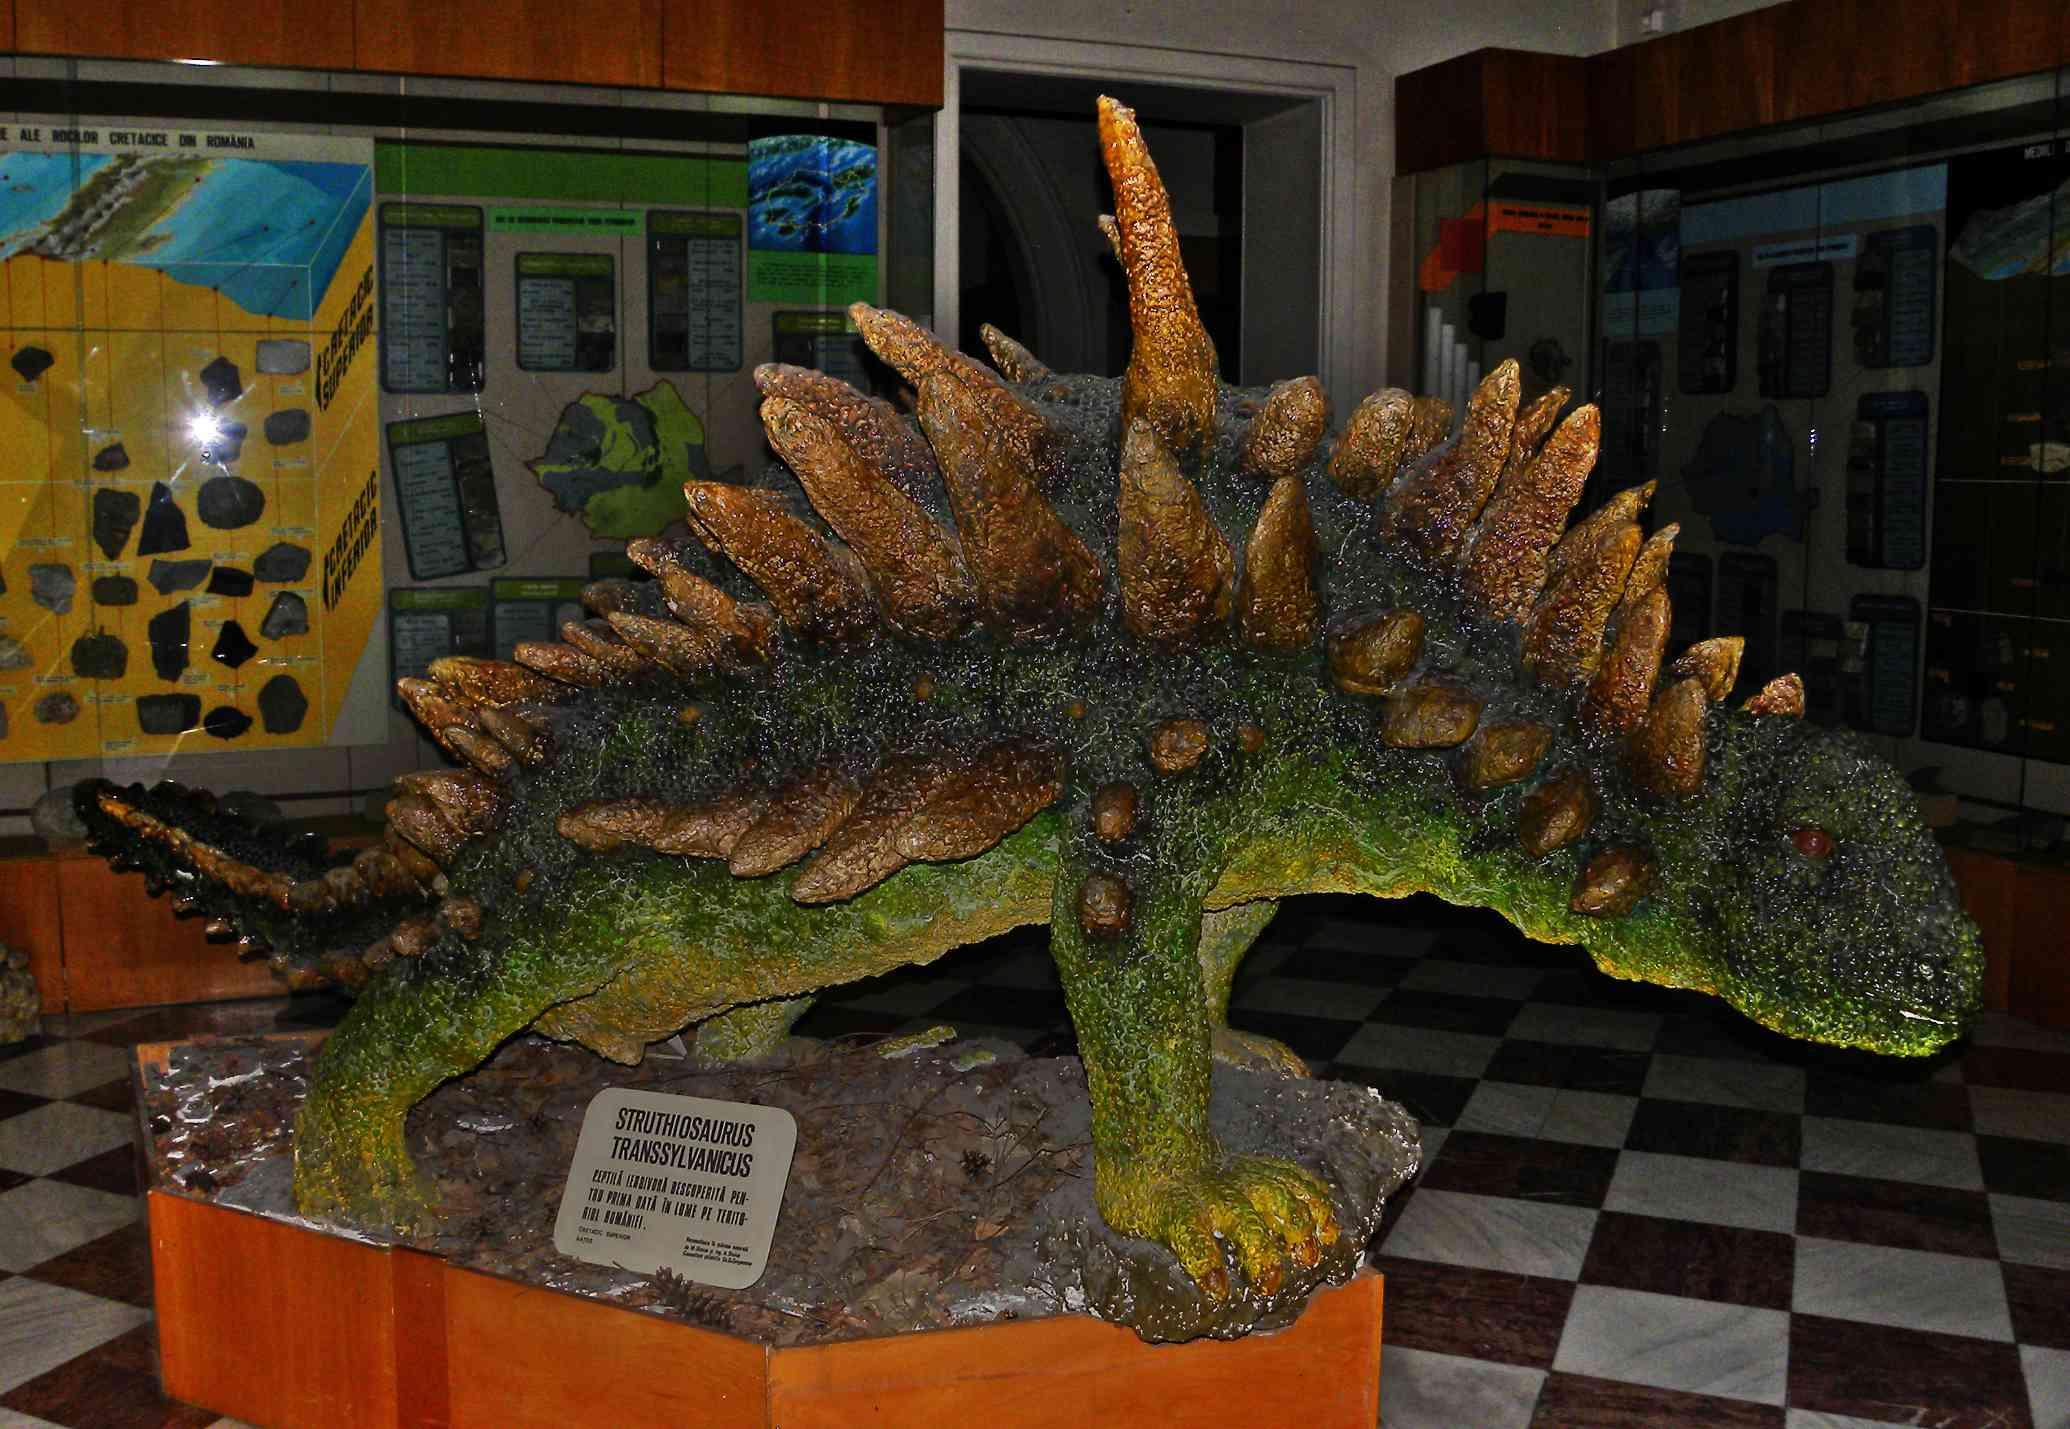 Model of struthiosaurus on display.